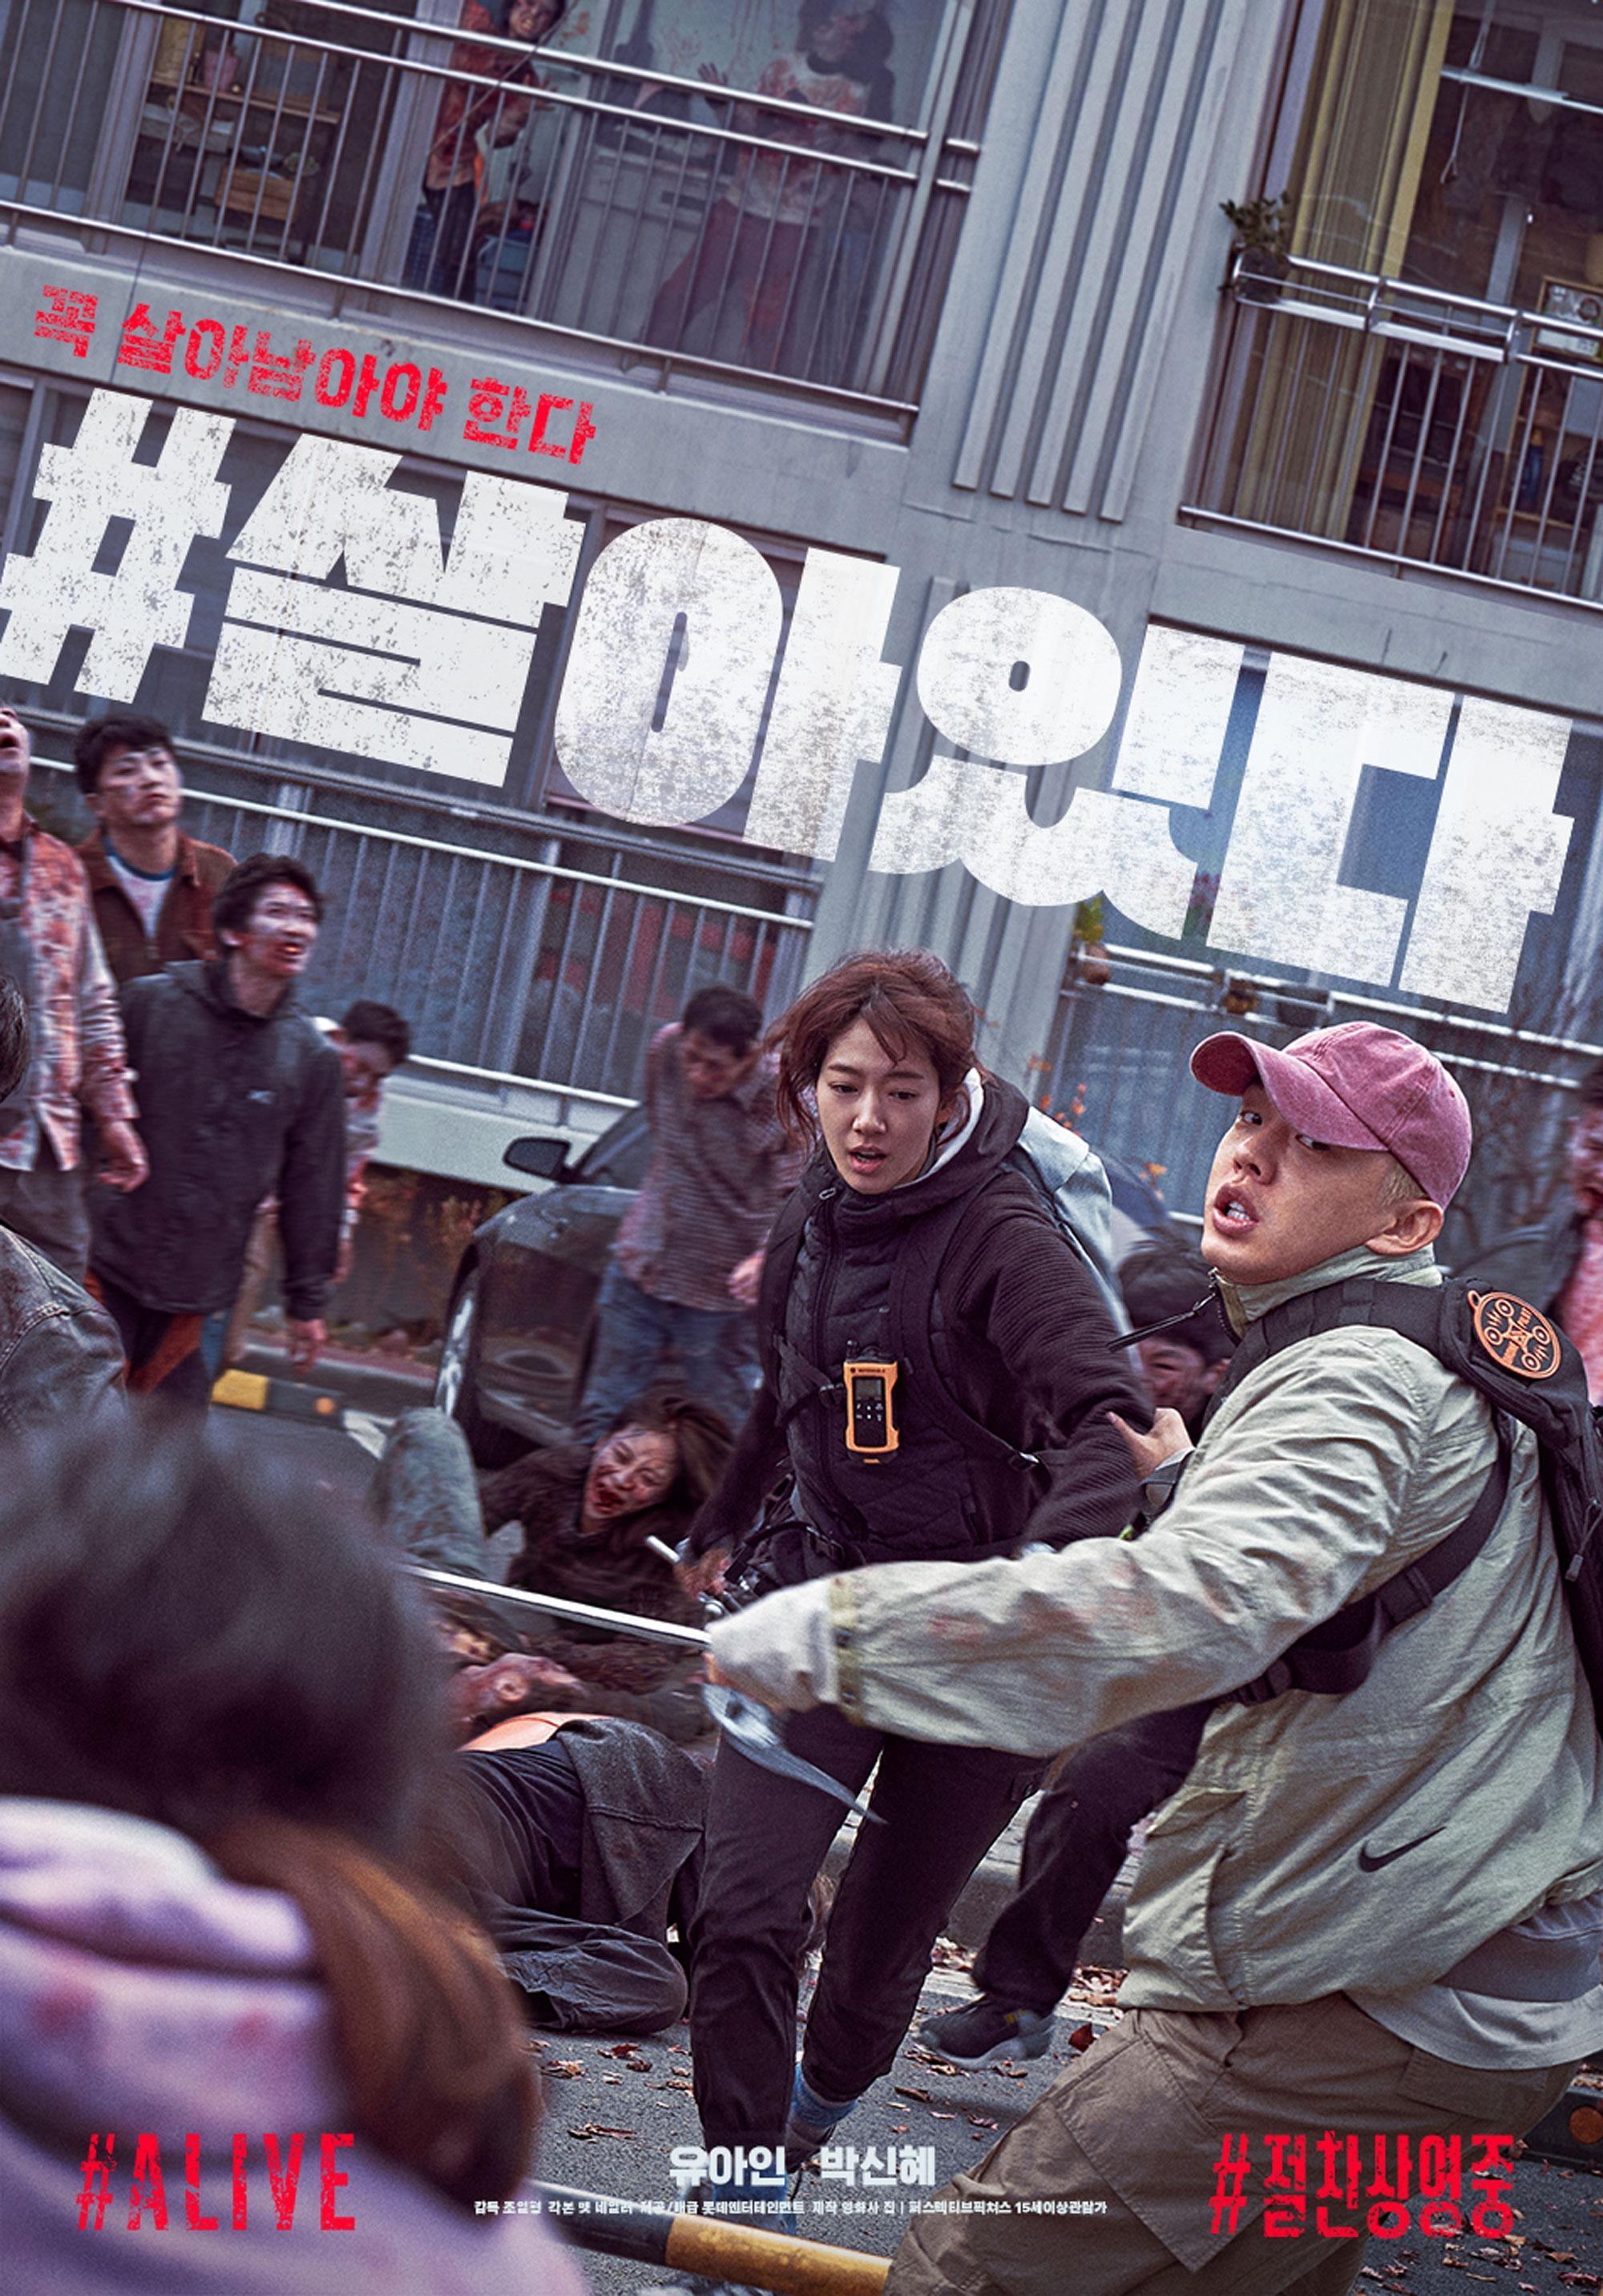 poster of #alive, new korean zombie movie on netflix 2020